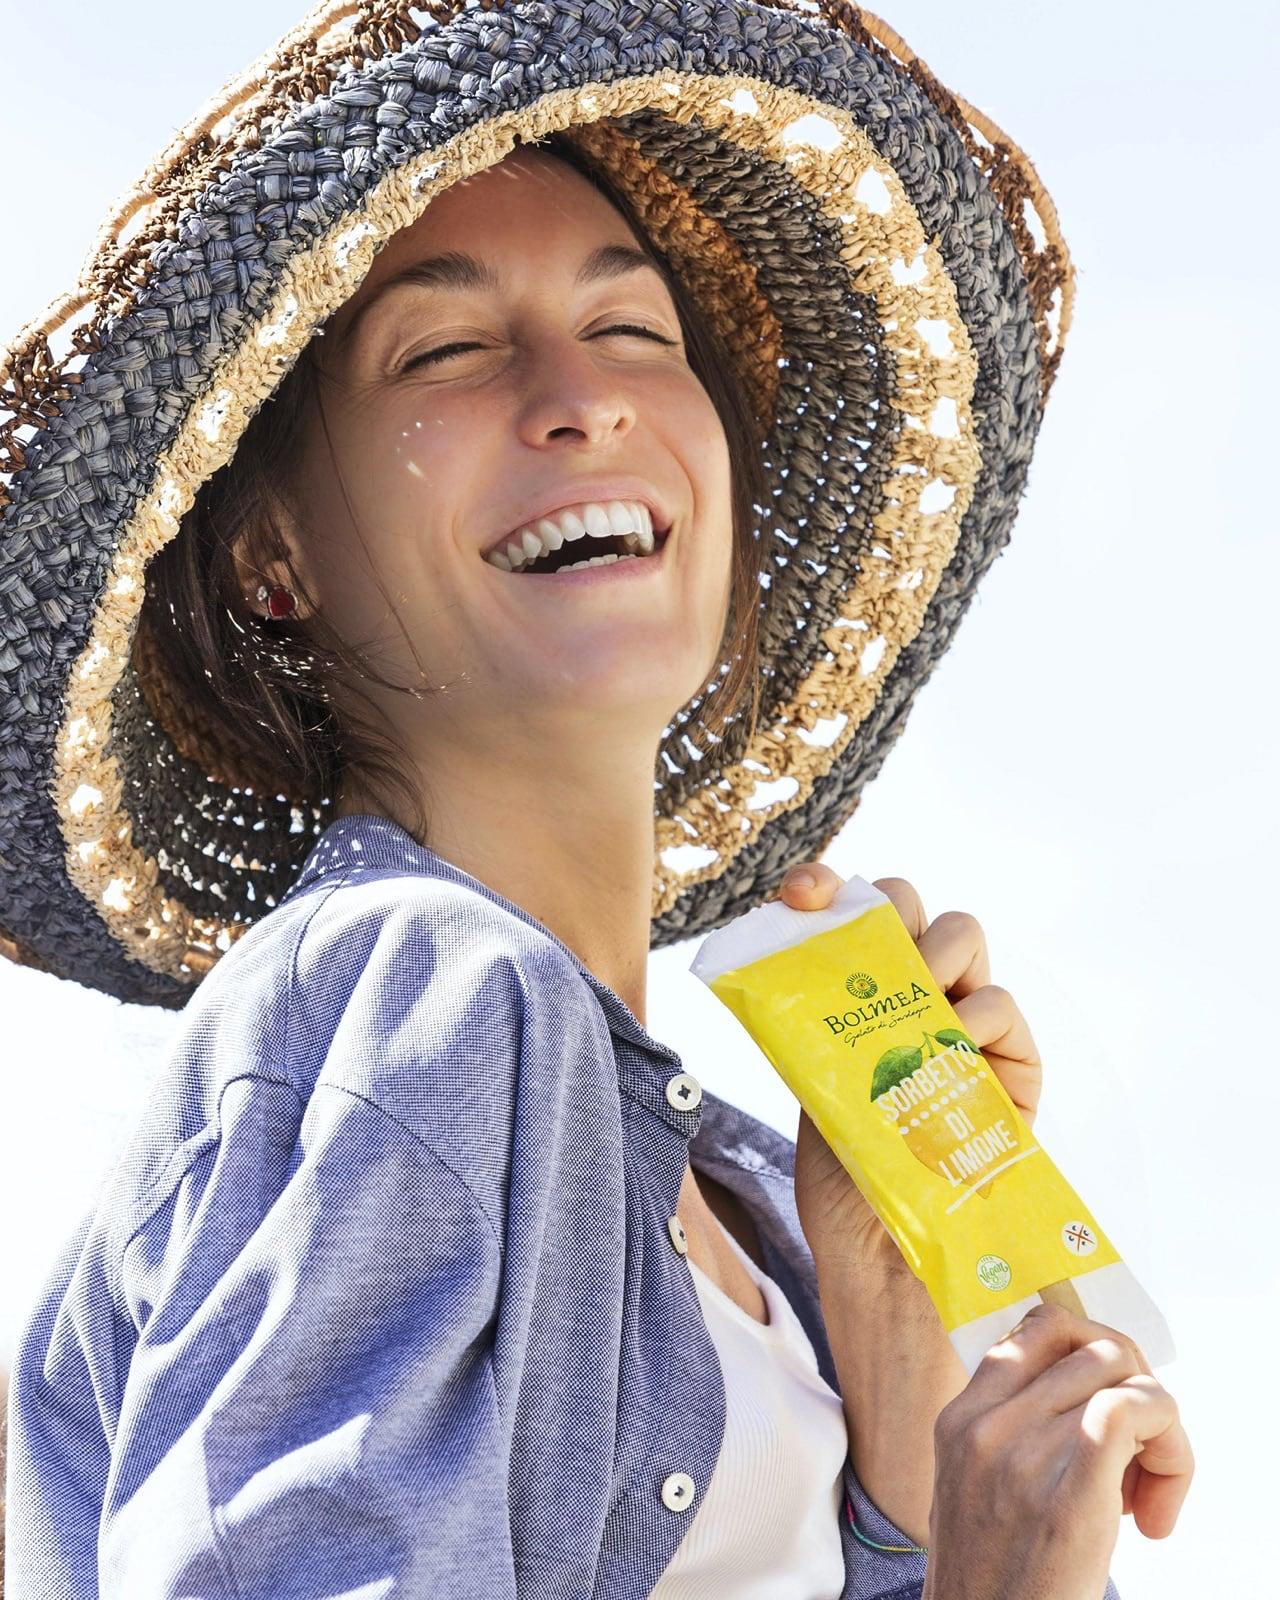 una ragazza sorride mentre tiene in mano un sorbetto al limone